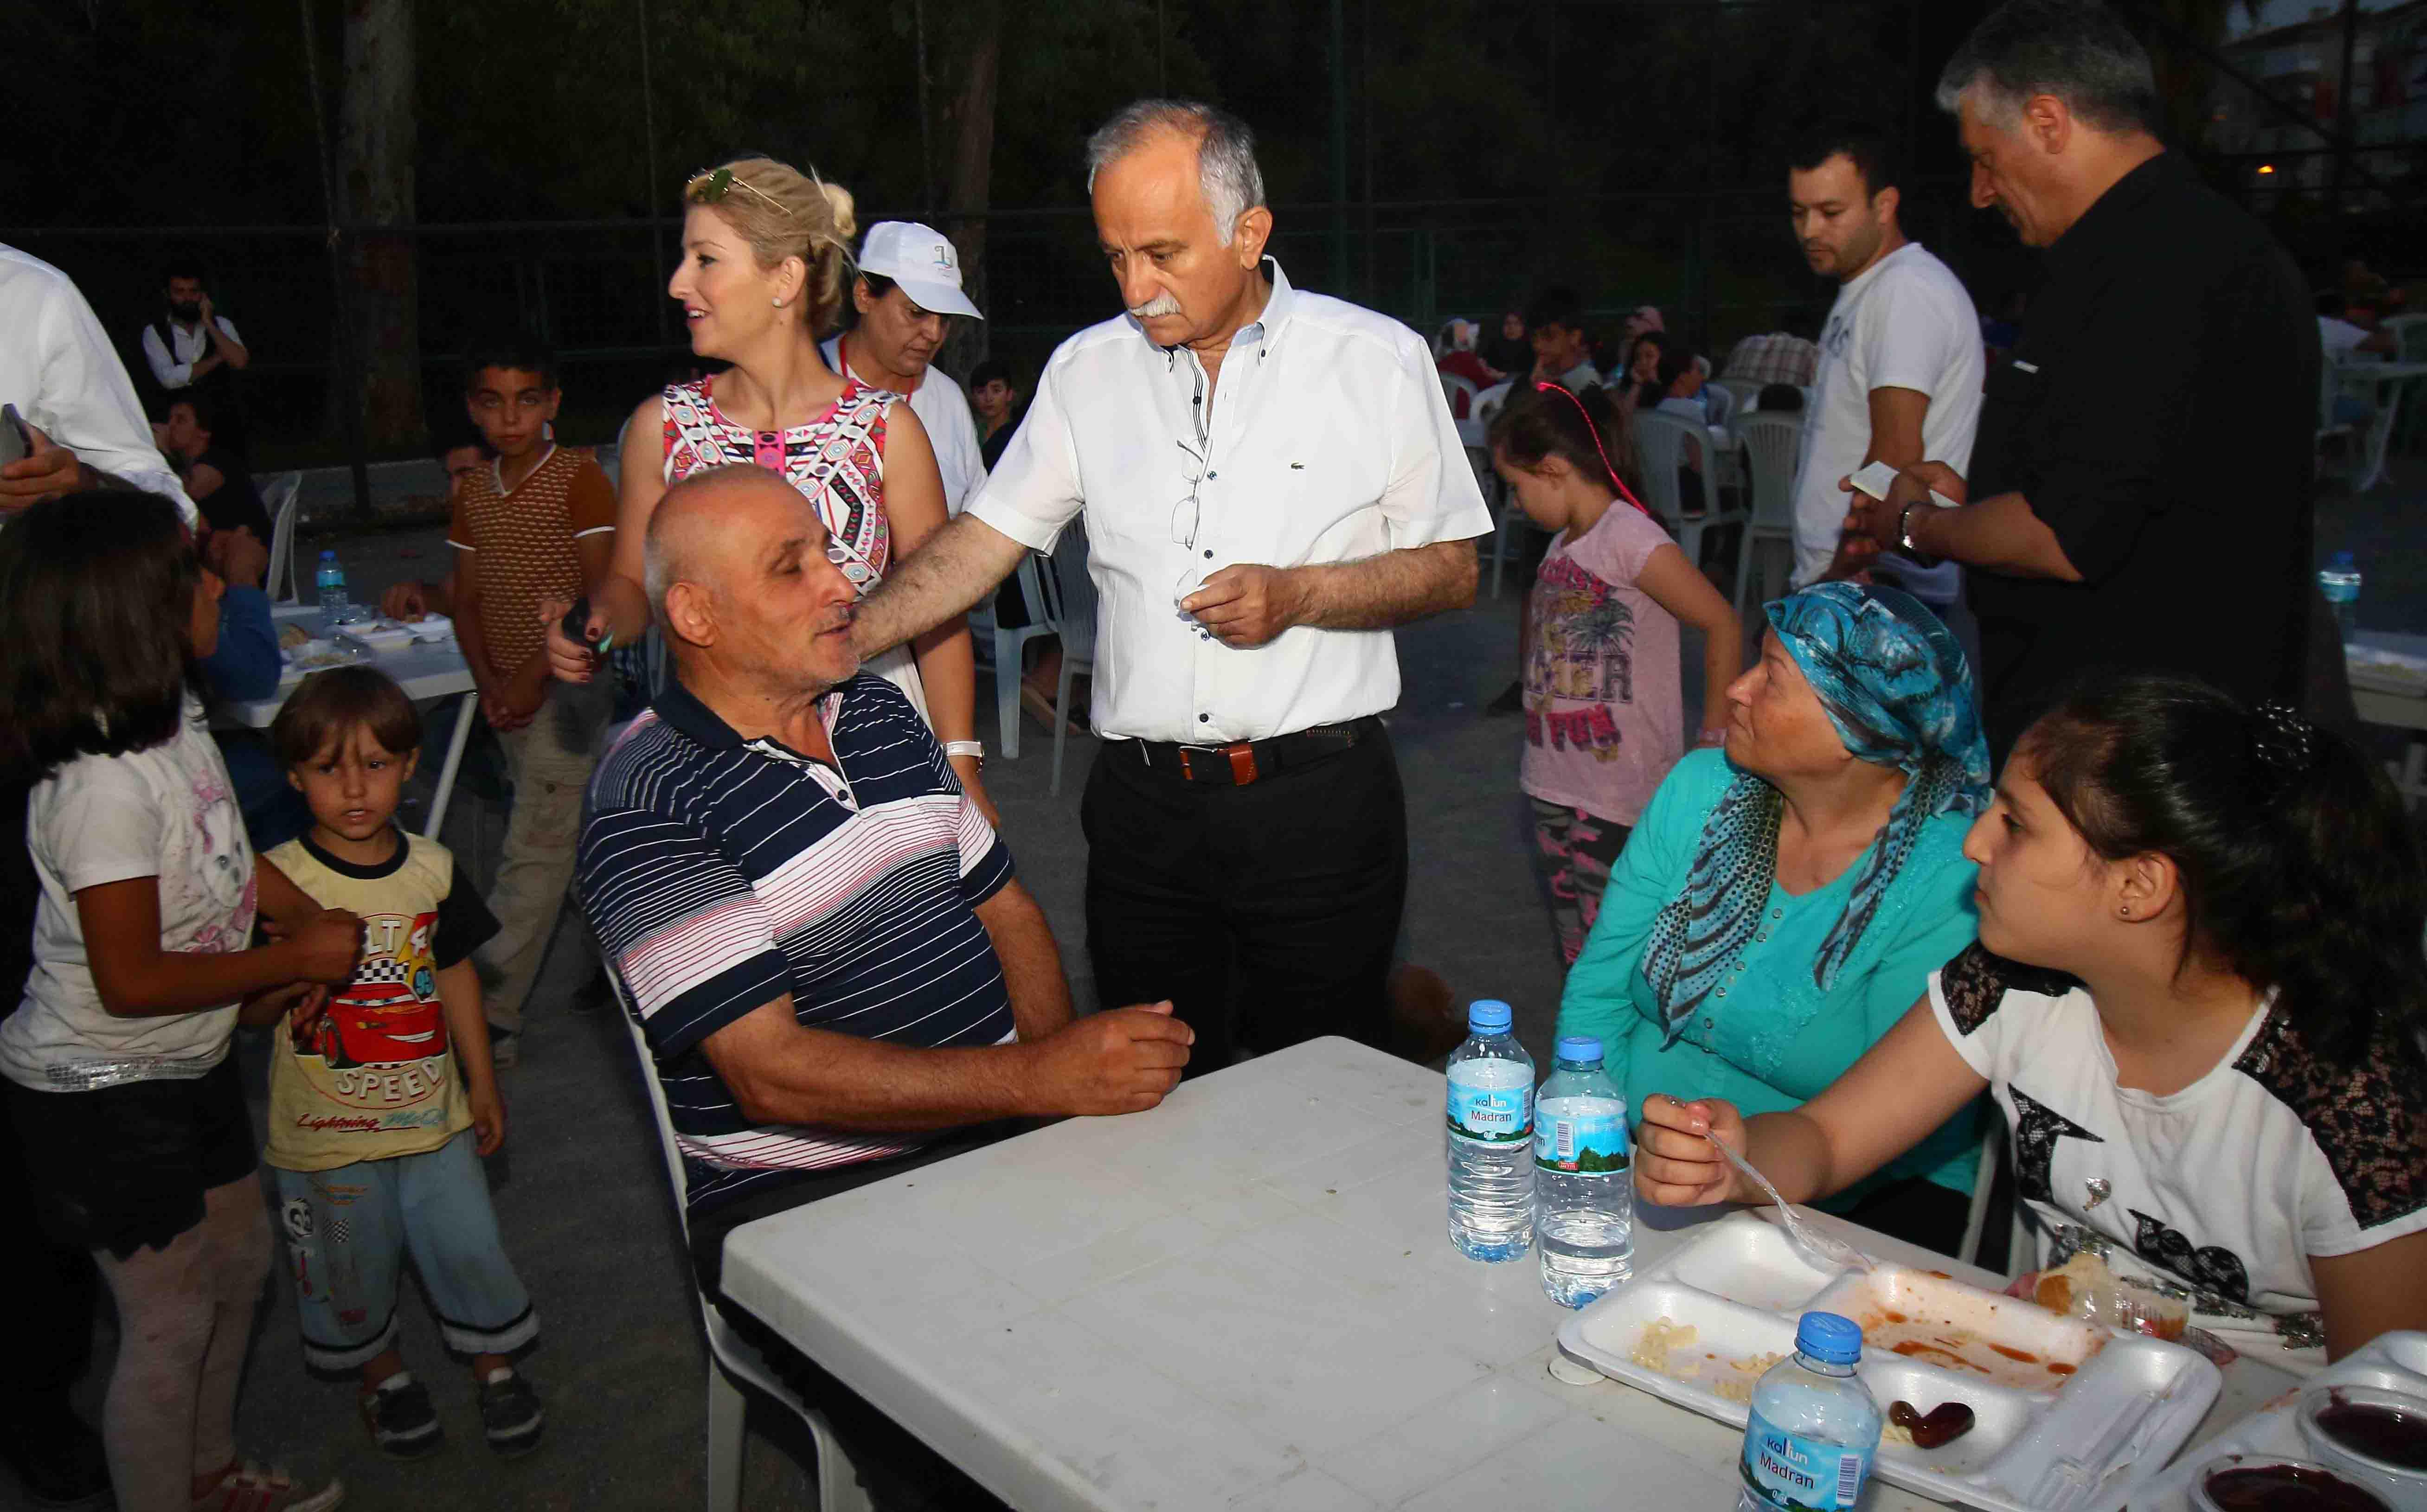 BAYRAKLI'DA 6 NOKTAYA İFTAR ÇADIRI